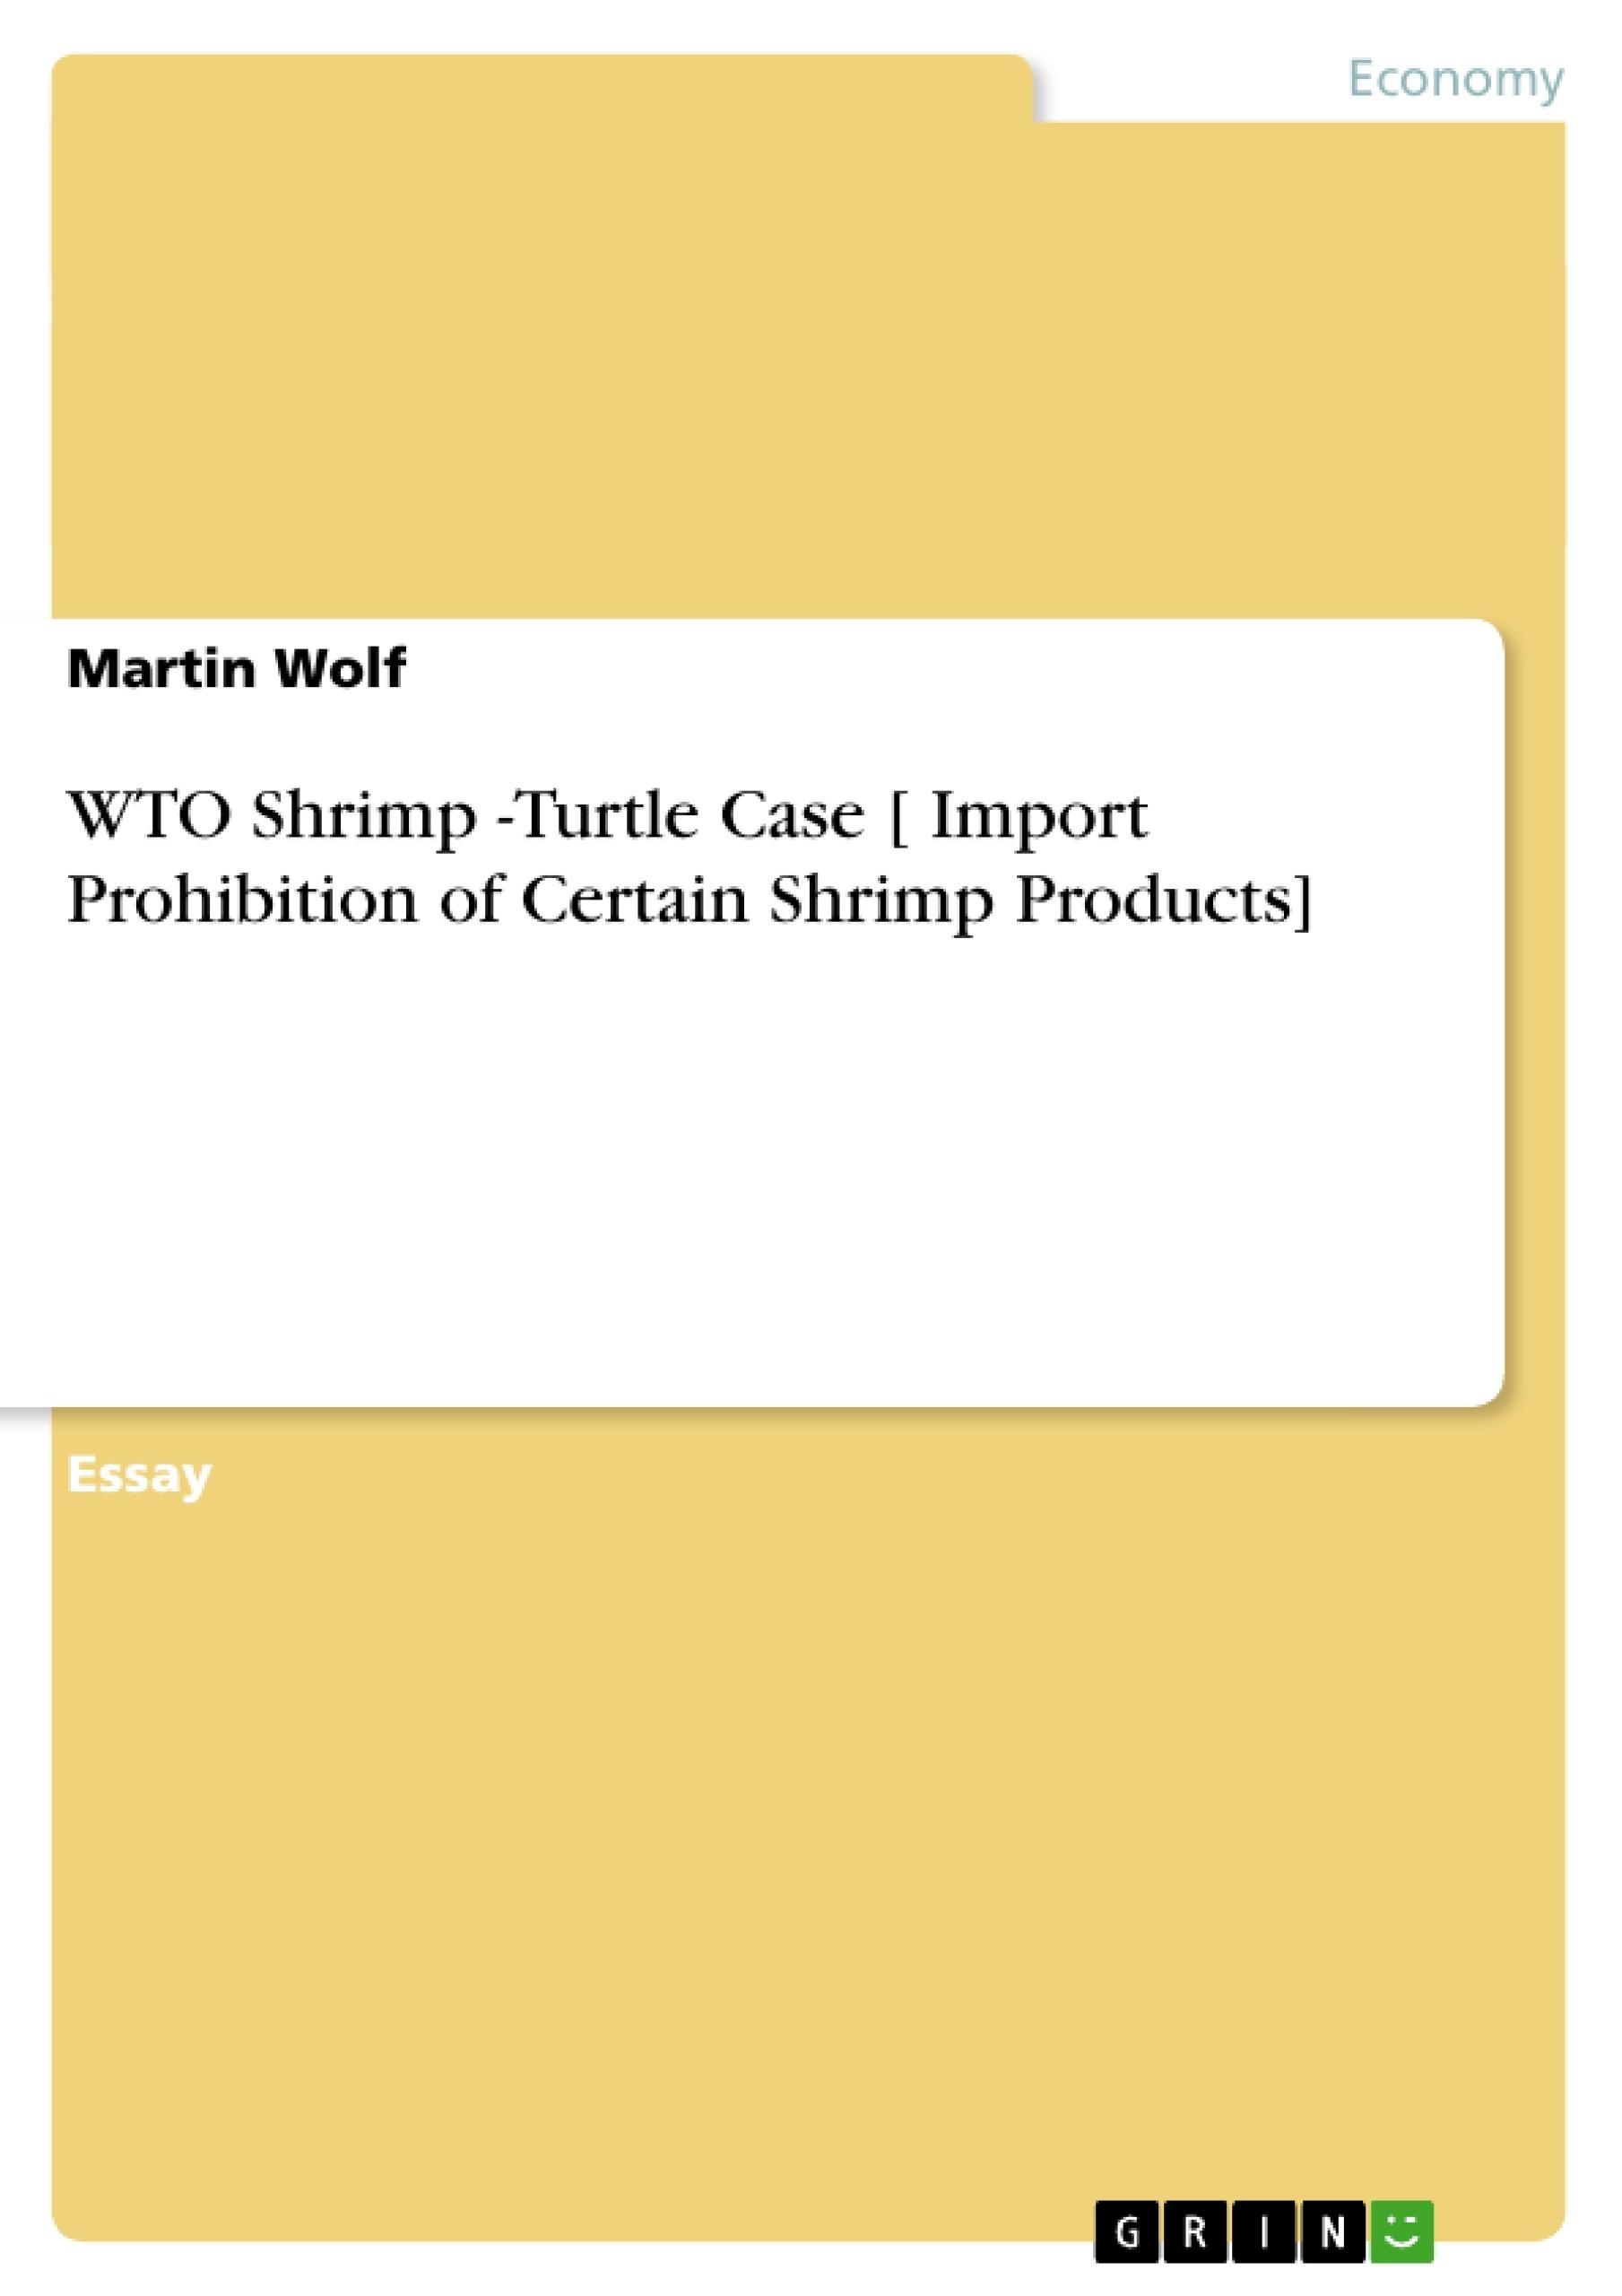 Title: WTO Shrimp -Turtle Case  [ Import Prohibition of Certain Shrimp Products]